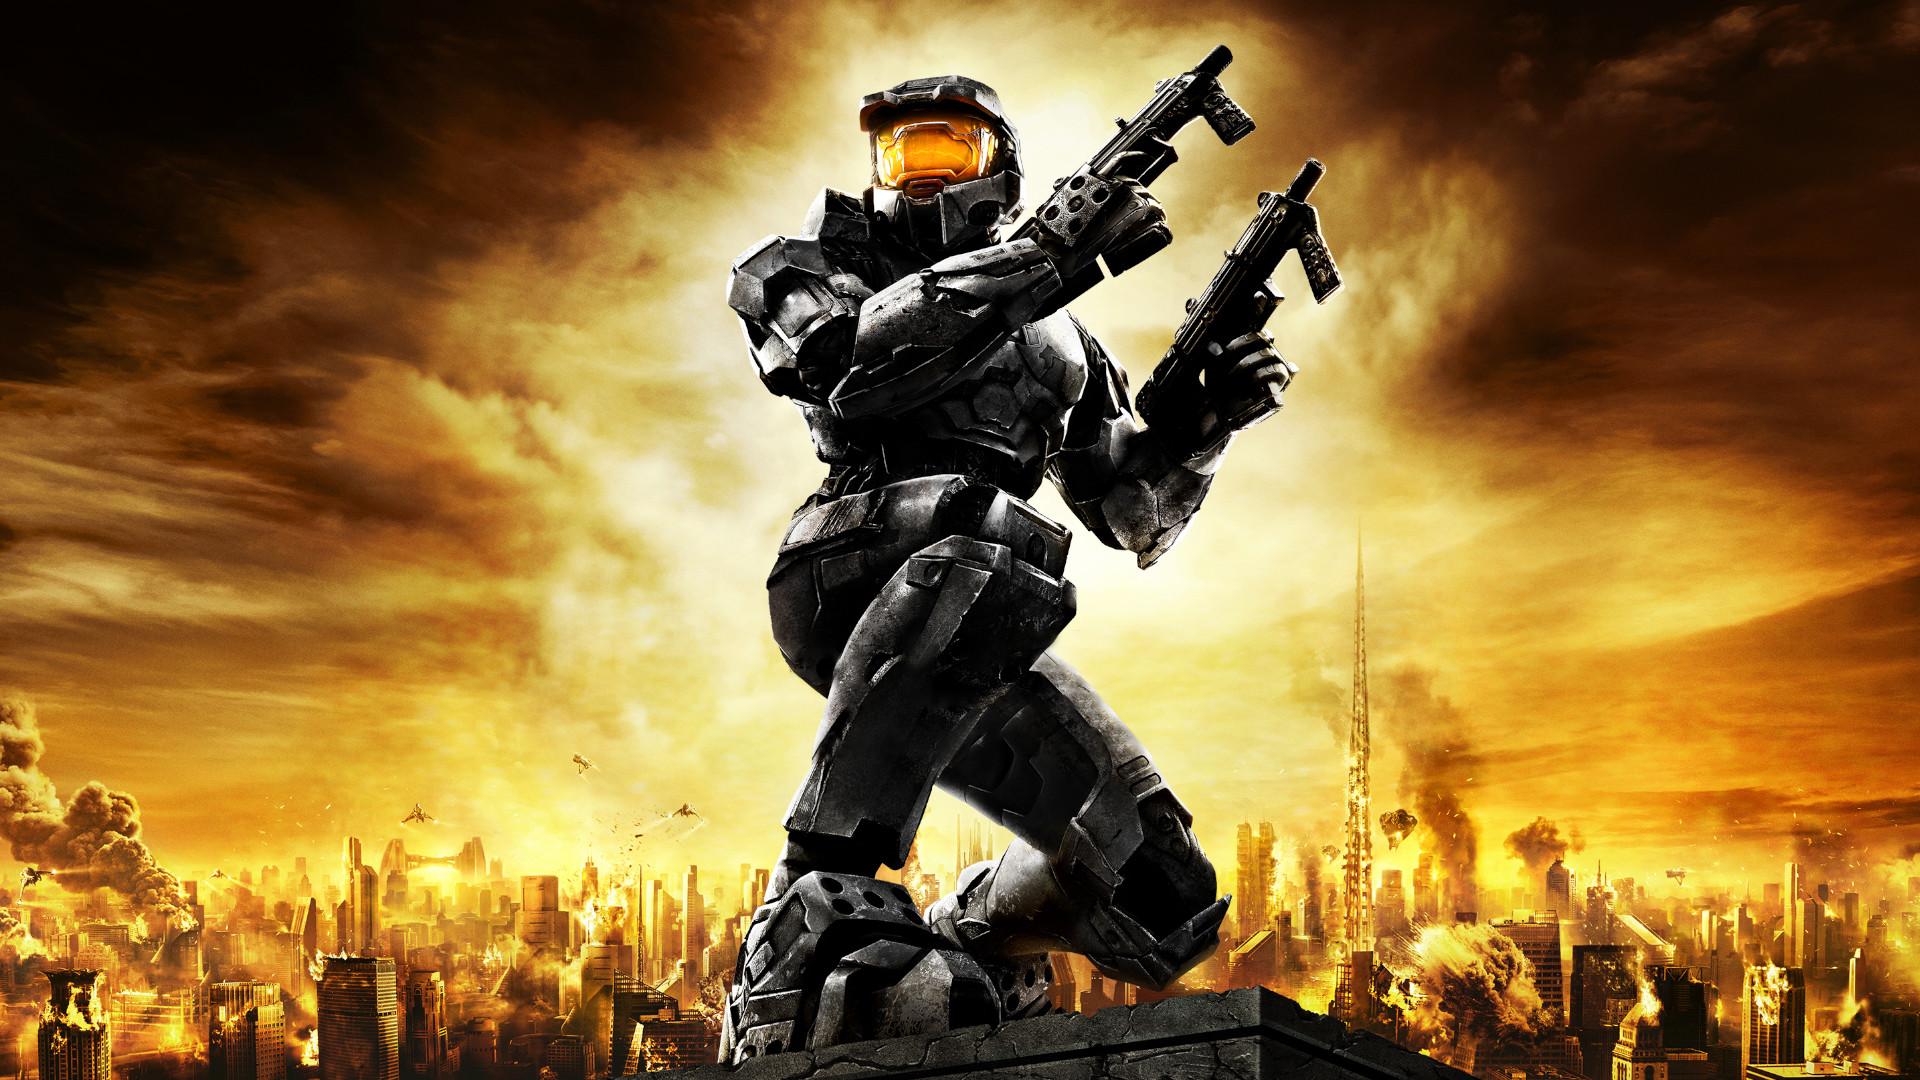 Halo 2 Anniversary Soundtrack 1080p Wallpaper No Text …